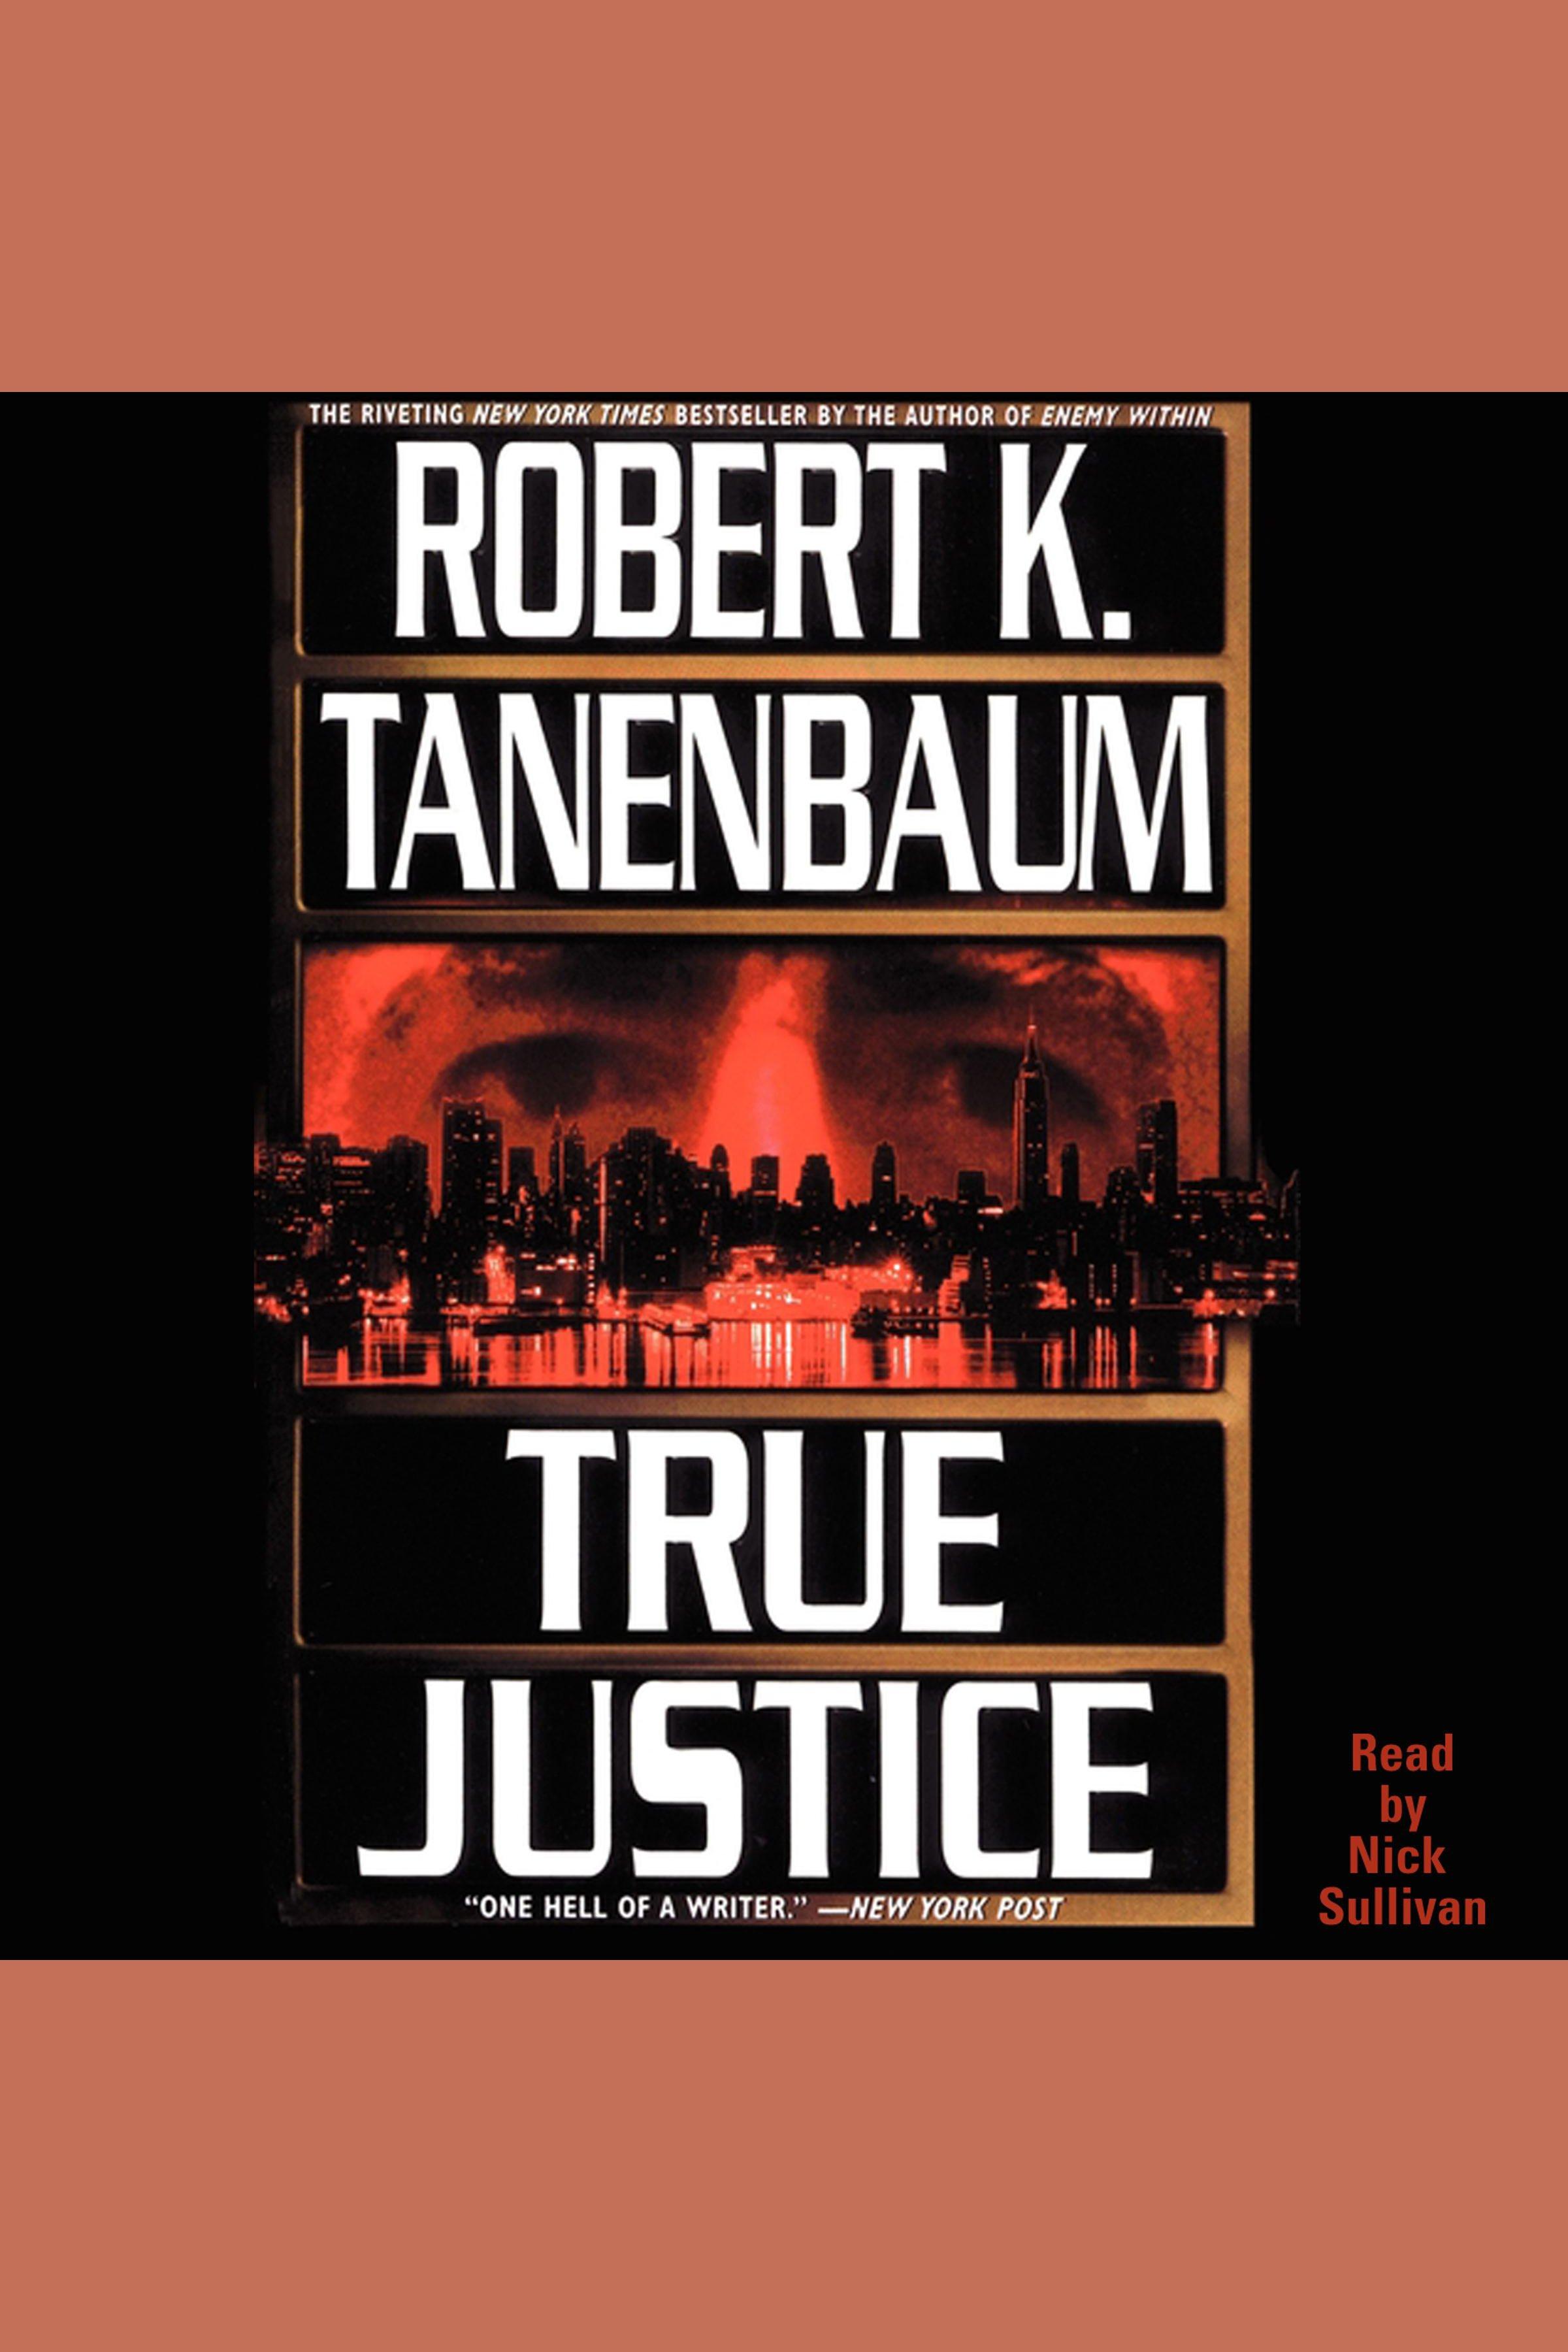 True Justice cover image